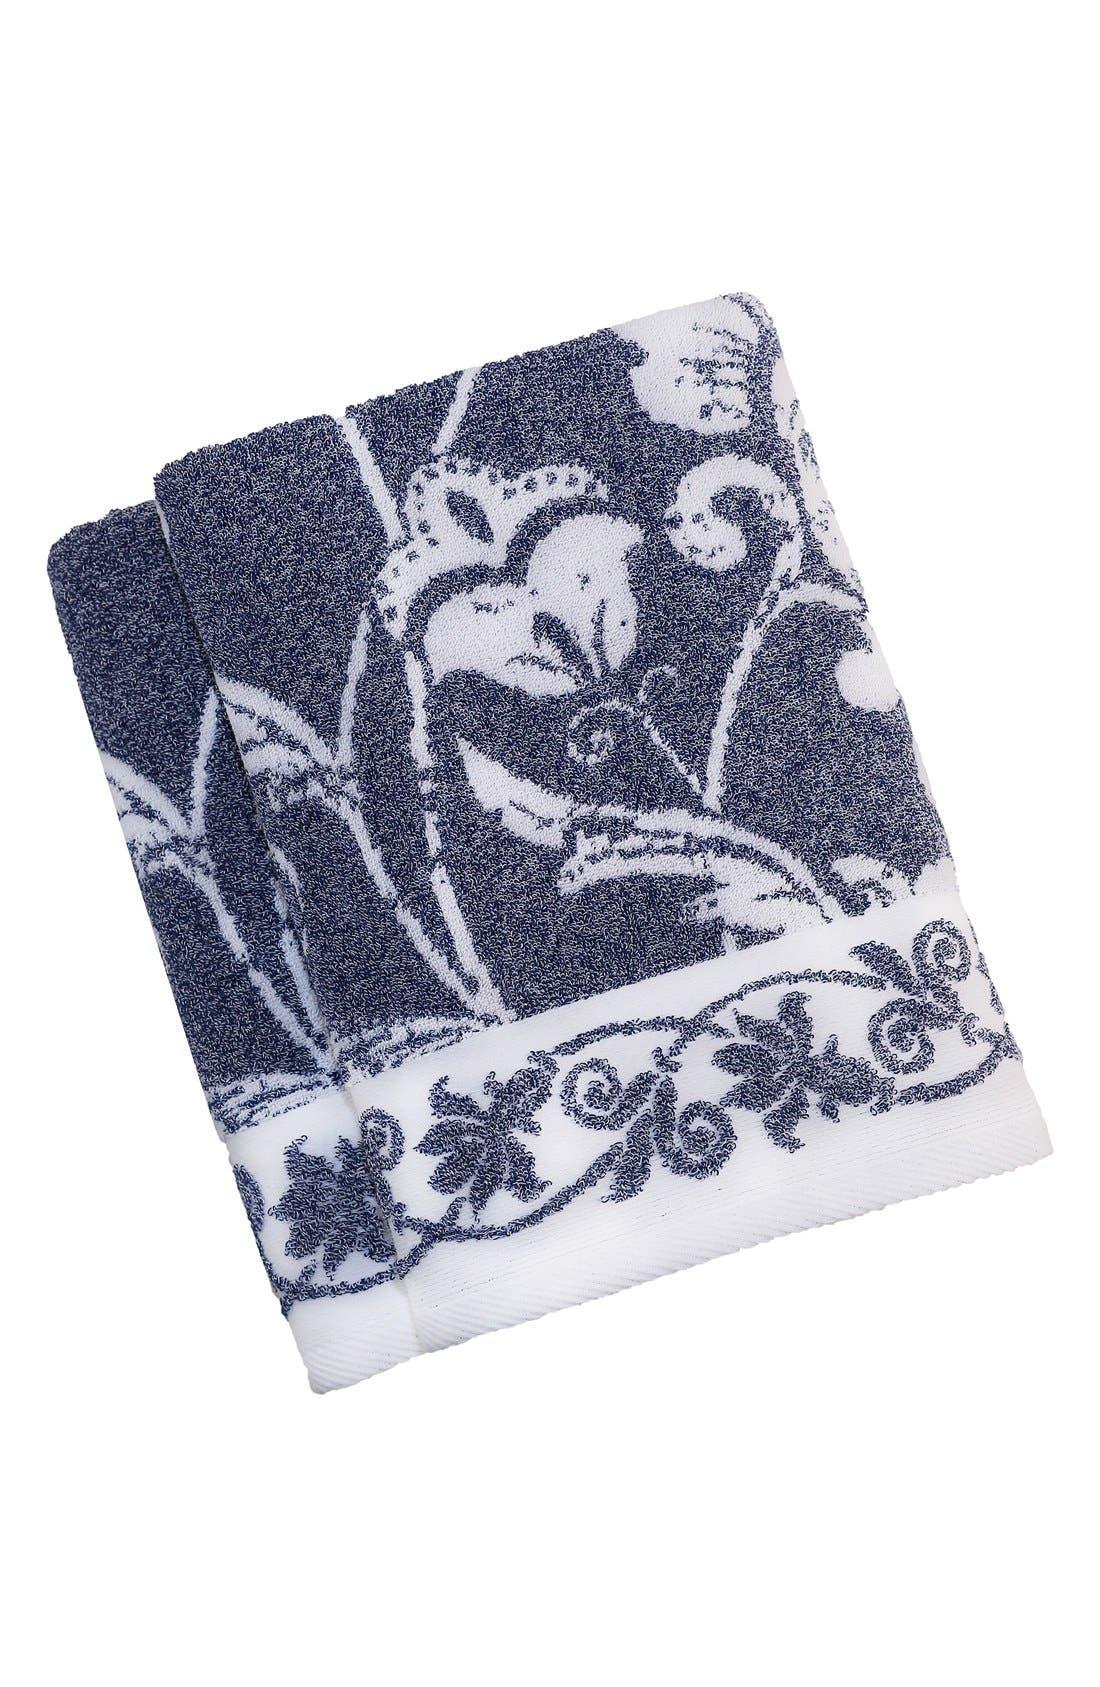 Linum 'Penelope' Turkish Cotton Bath Towels (Set of 2)